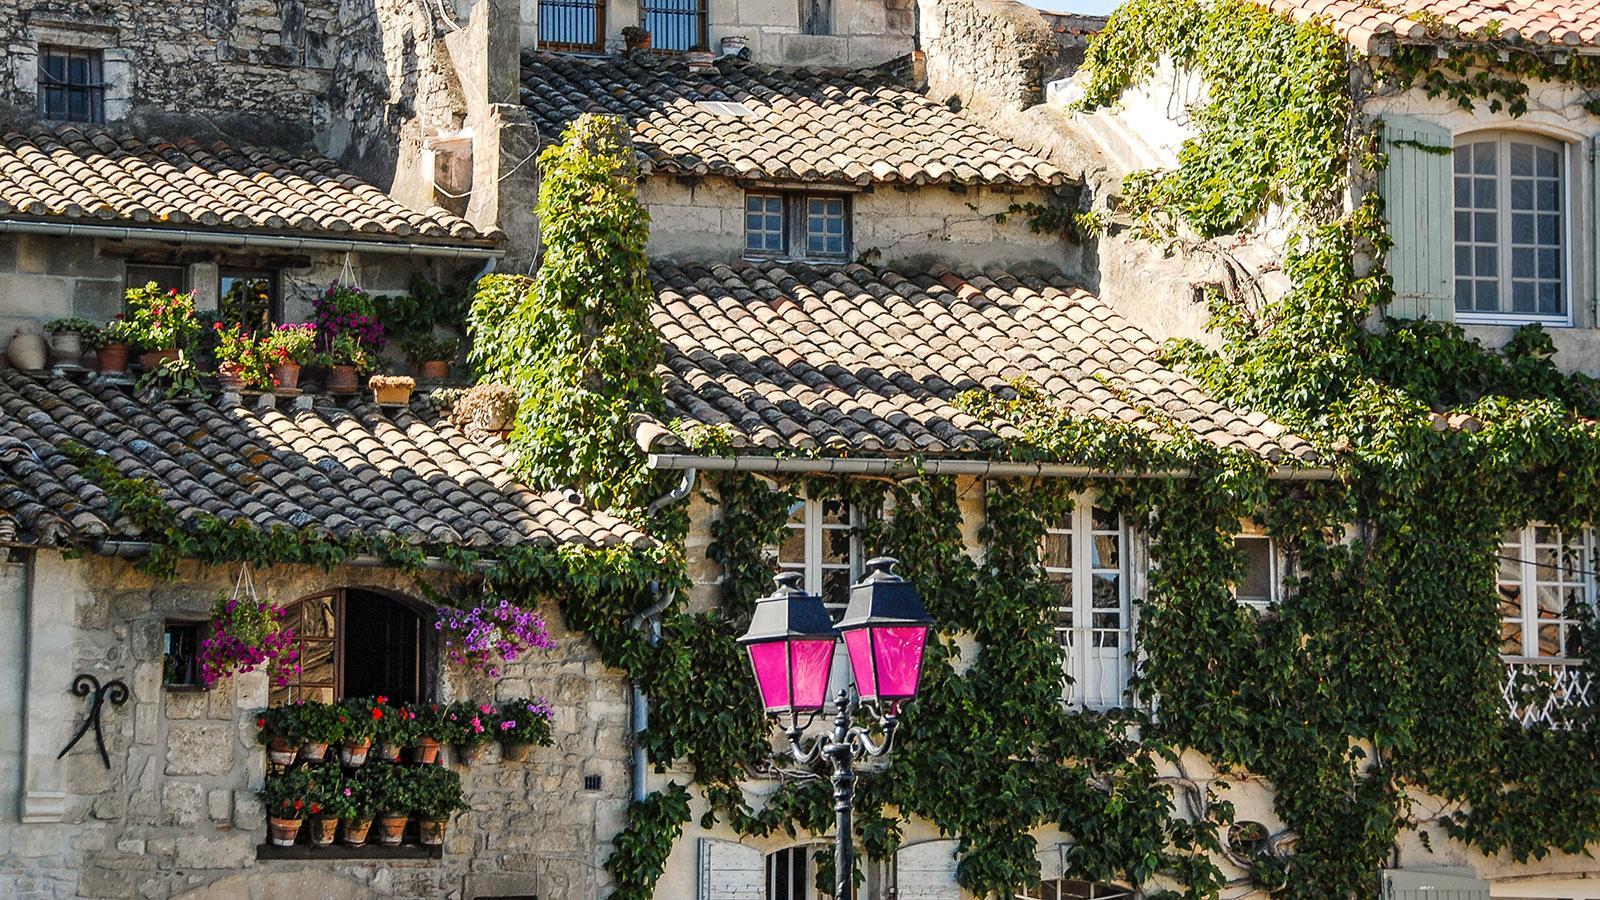 Arles: Straßenlampen in Lila schmücken das Rhôneufer. Foto: Hilke Maunder